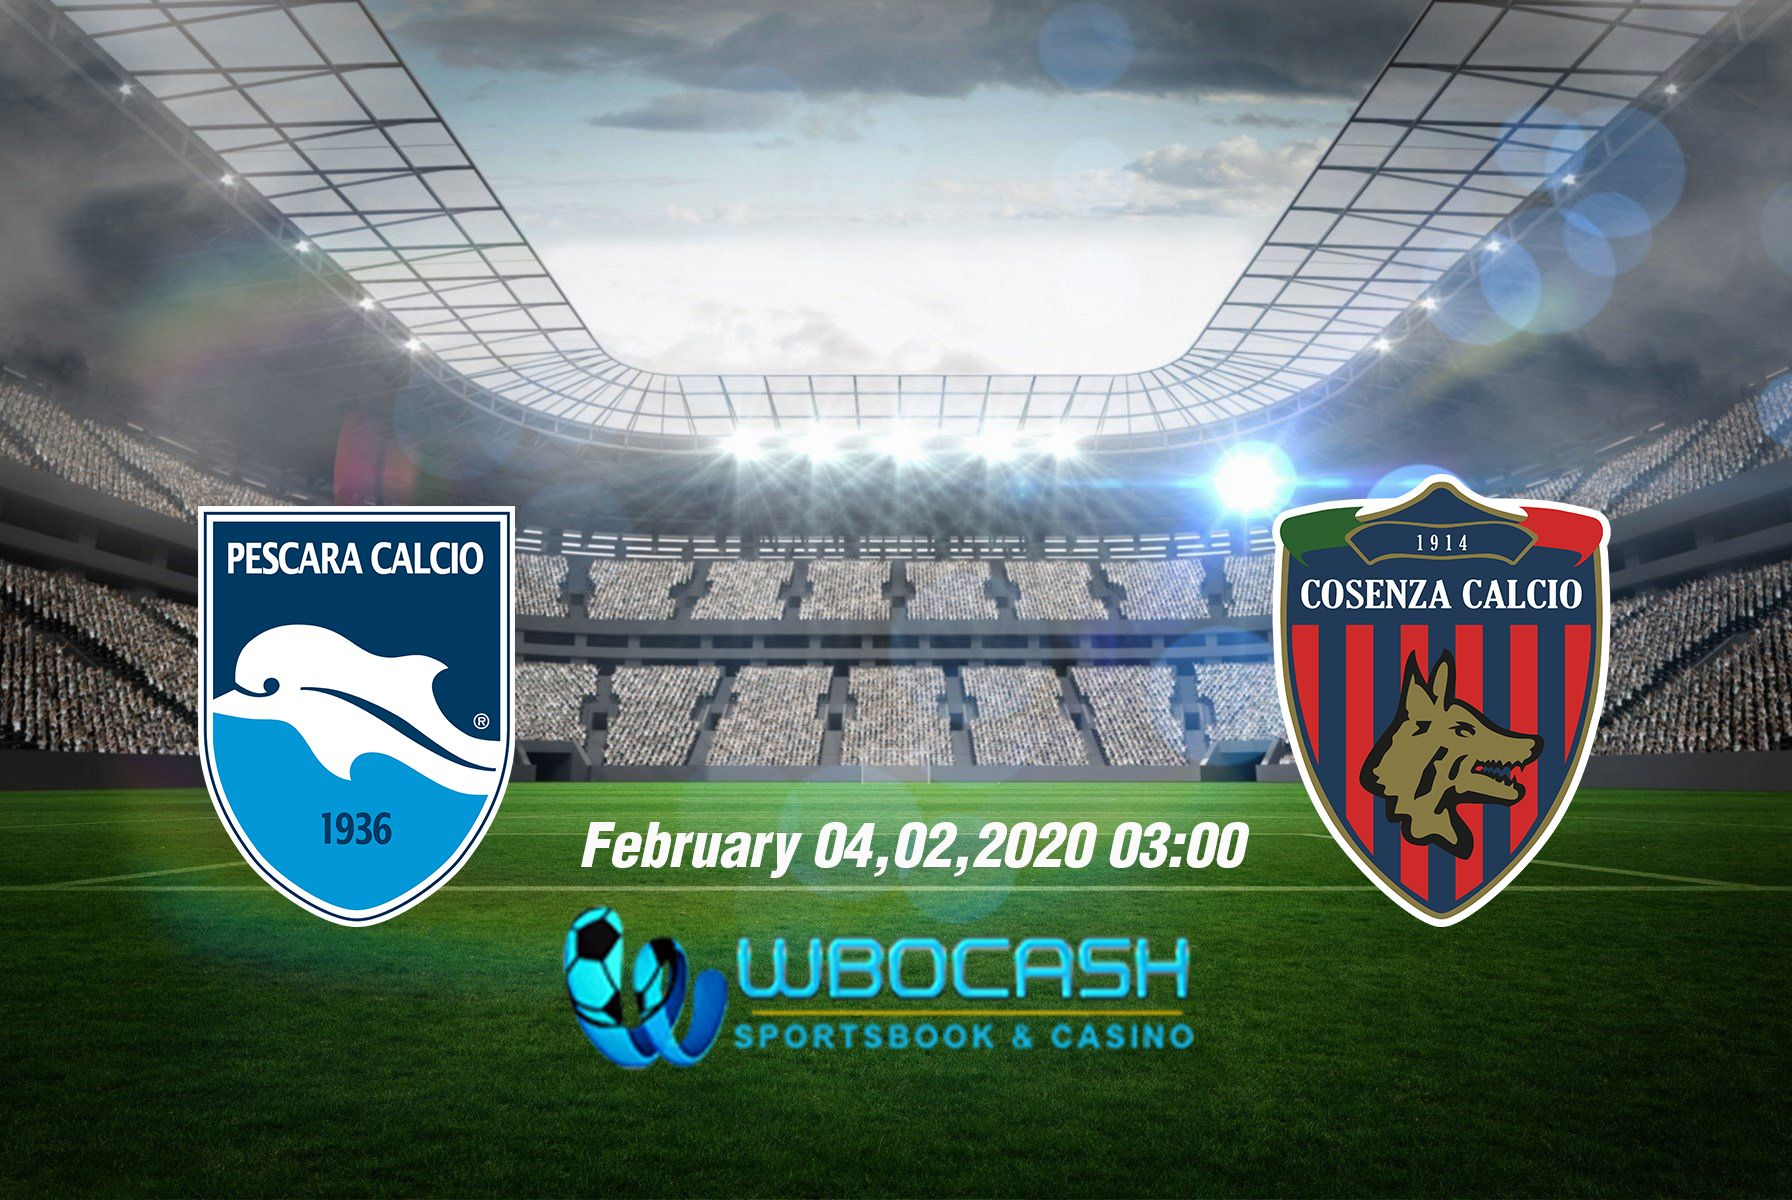 Prediksi Skor Bola Pescara Vs Cosenza 4 February 2020 Pelayan Asia Poker